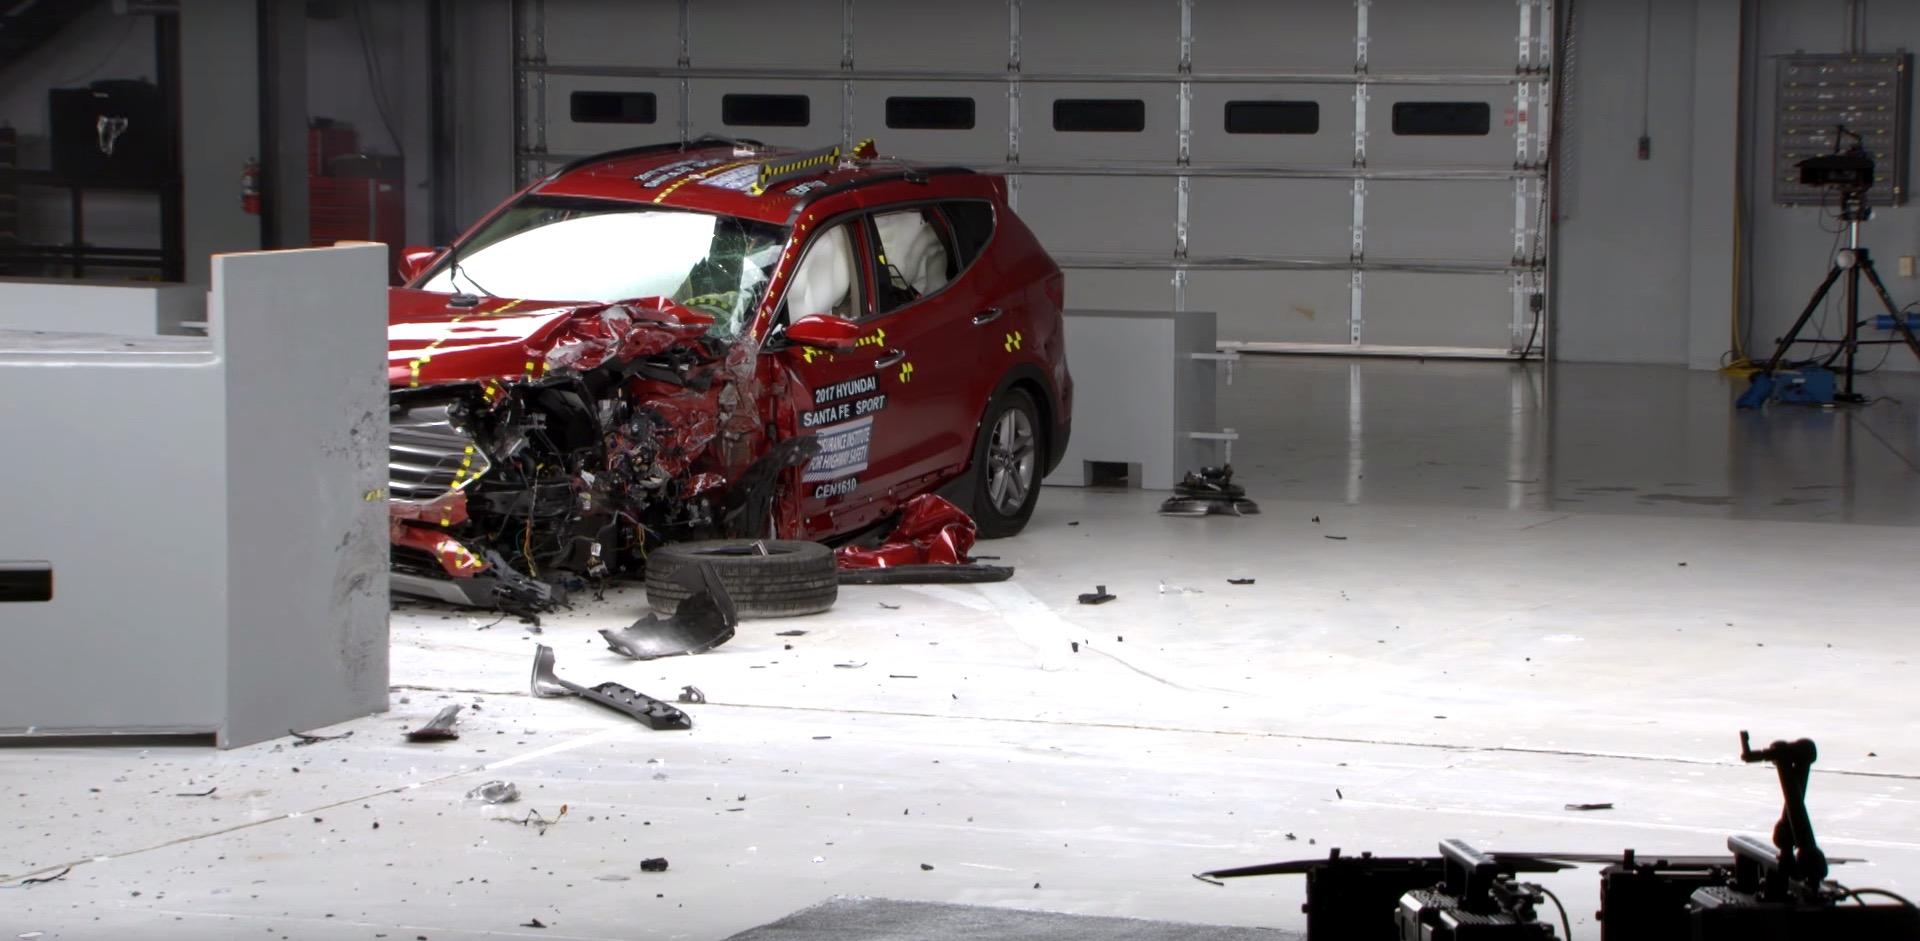 2017 hyundai santa fe sport crash tested earns top safety pick rating autoevolution. Black Bedroom Furniture Sets. Home Design Ideas